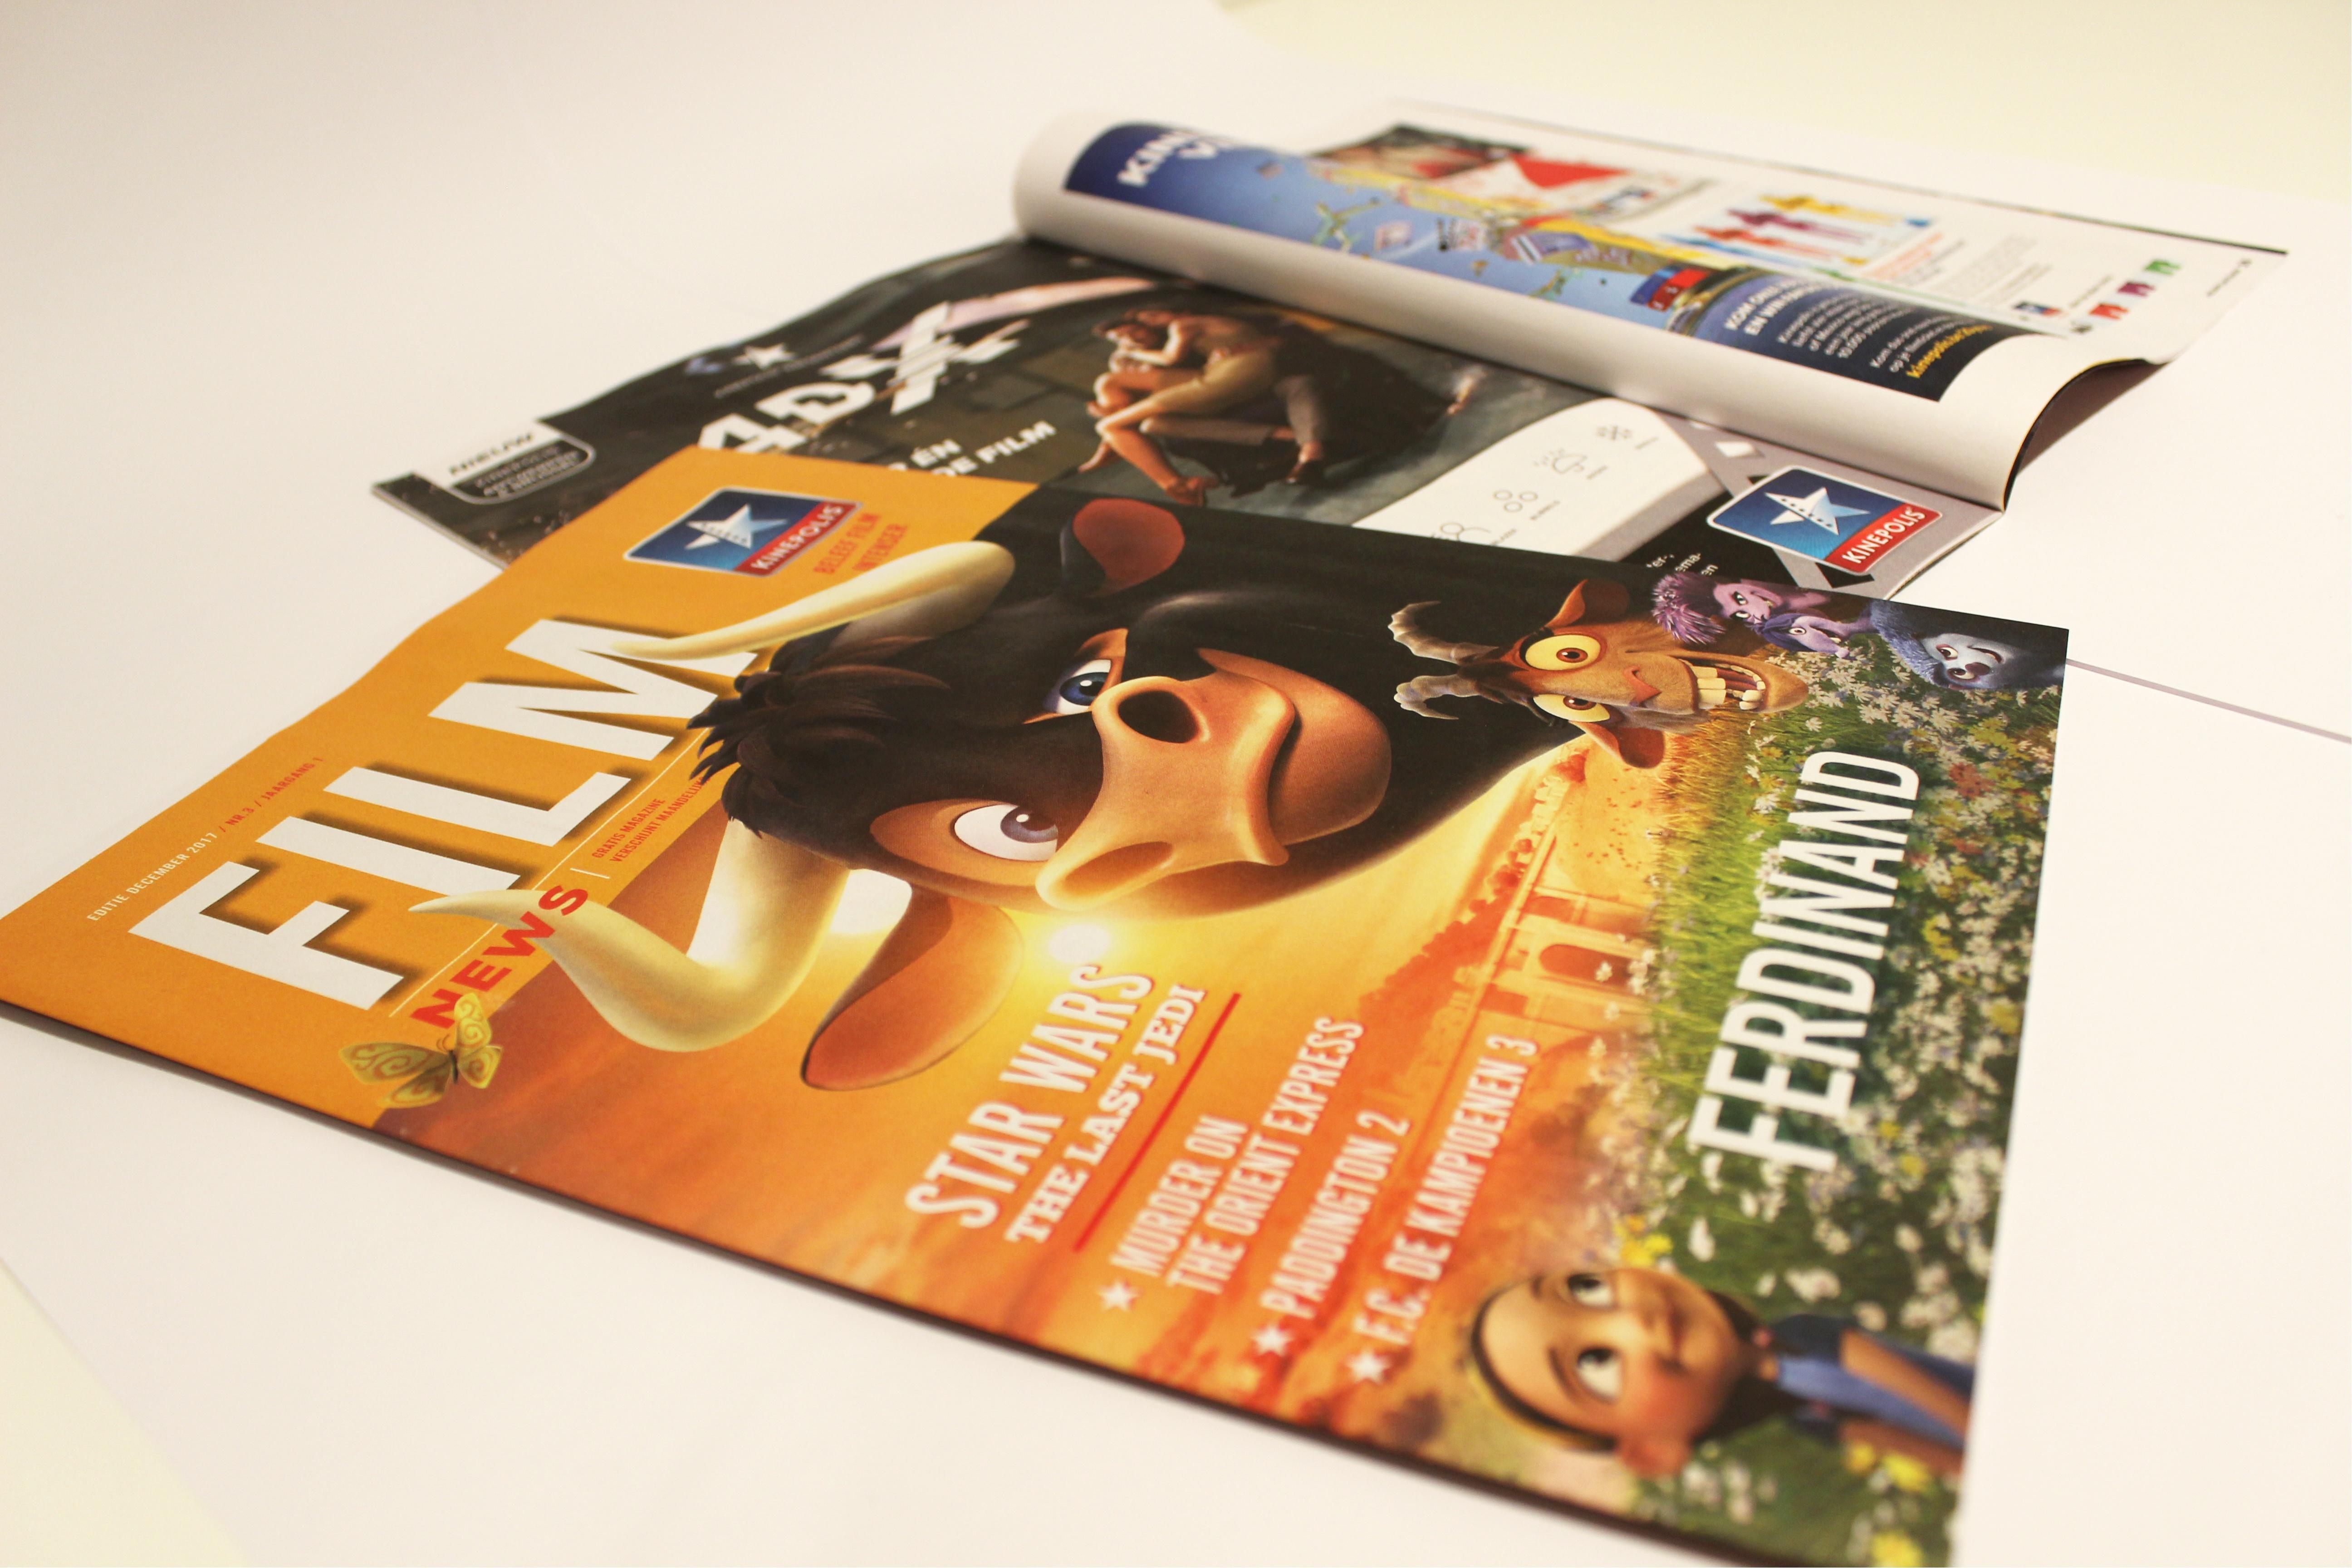 Magazine du Cinéma Kinepolis